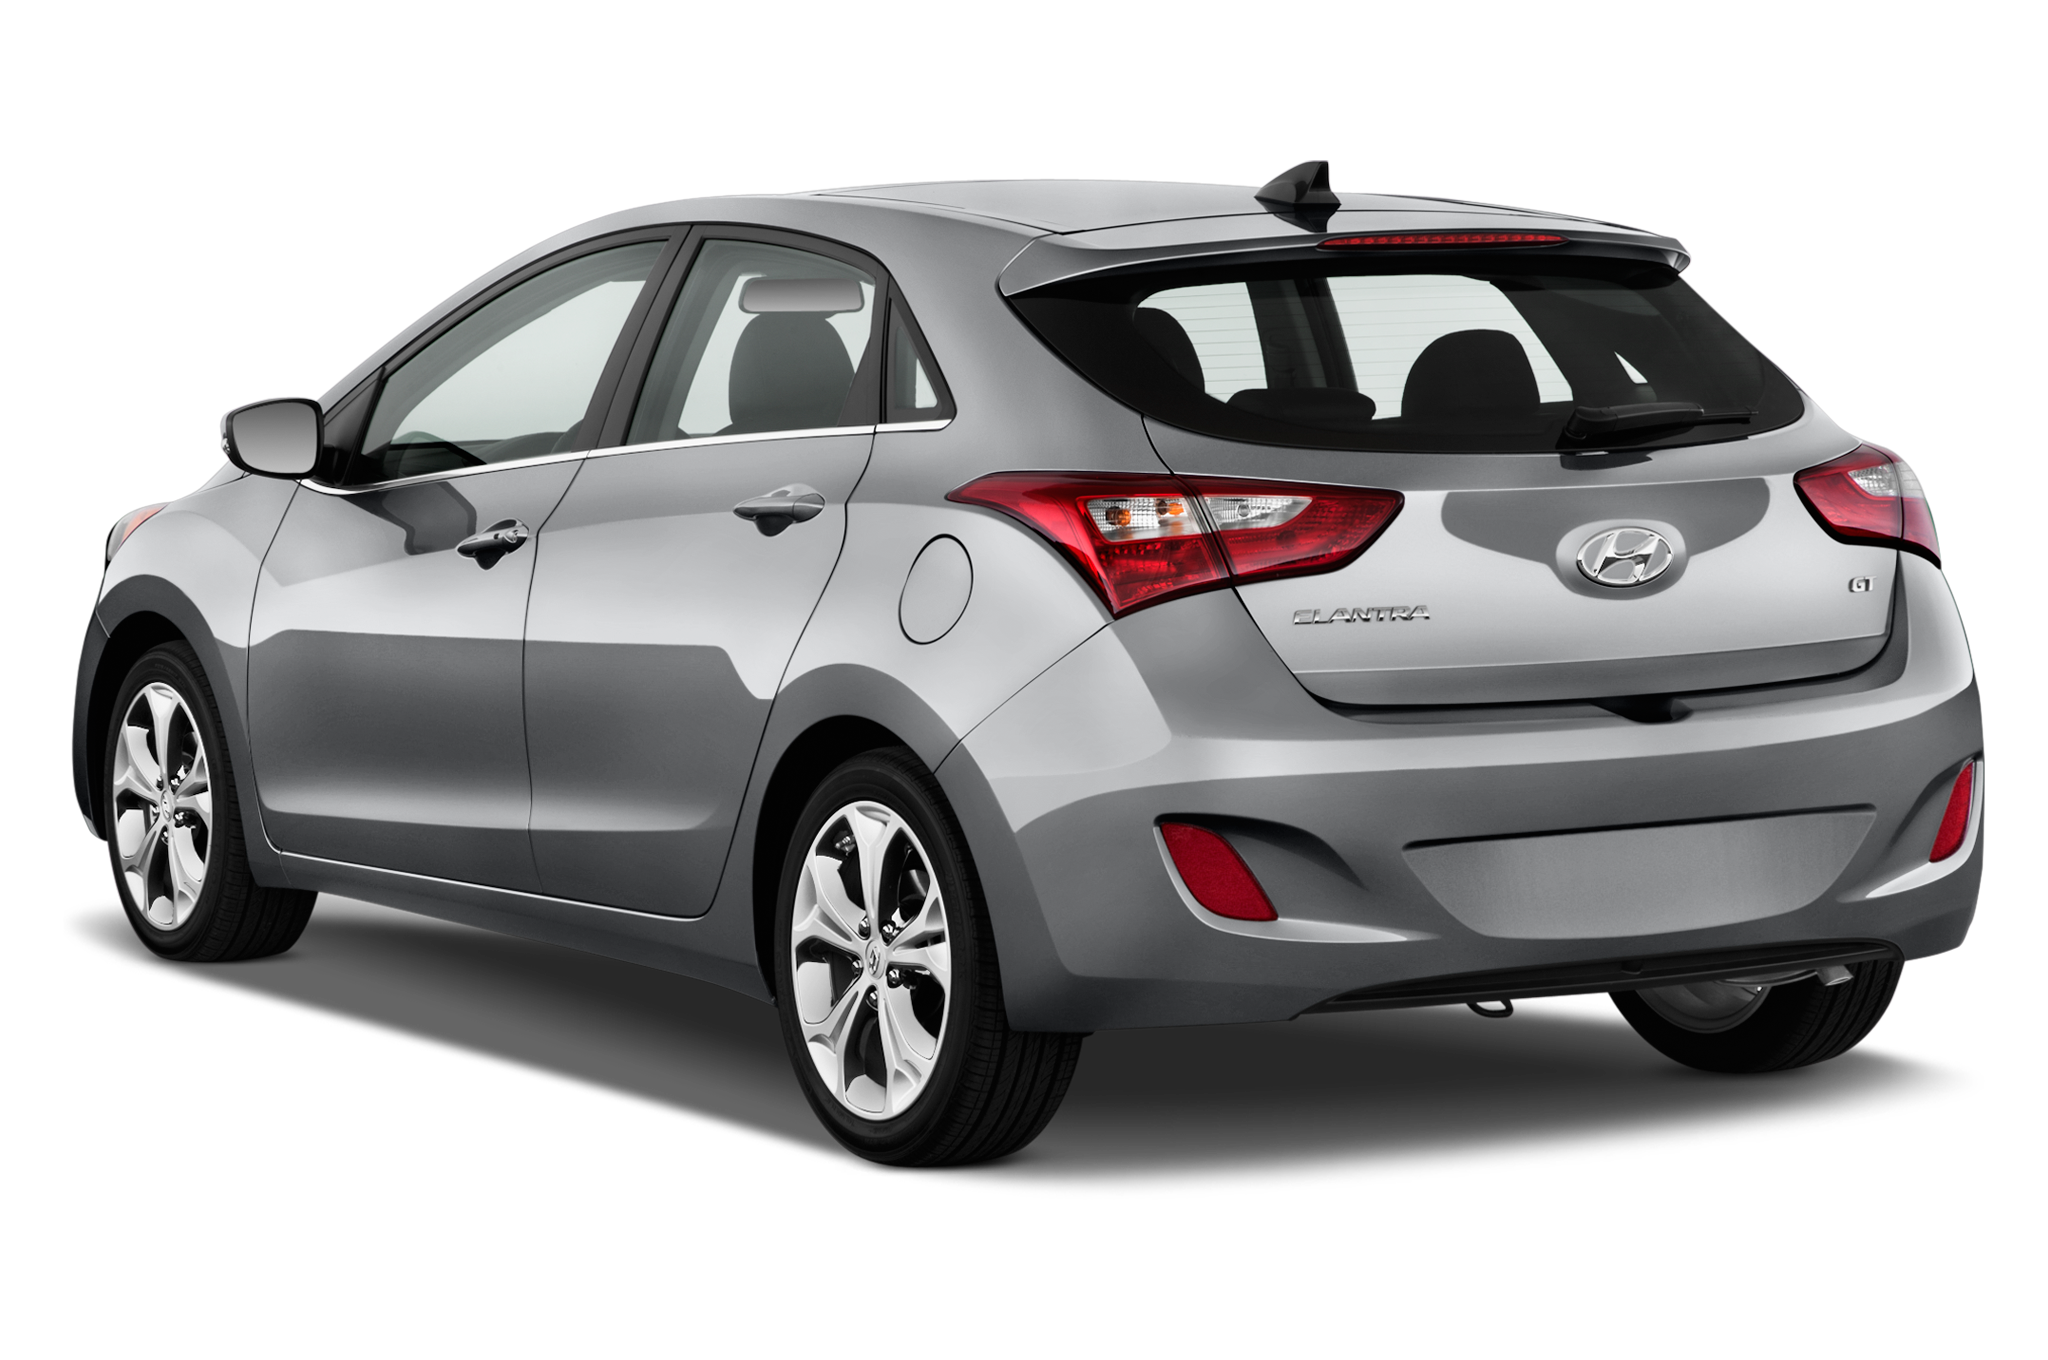 2015 Hyundai Elantra Priced From 18 060